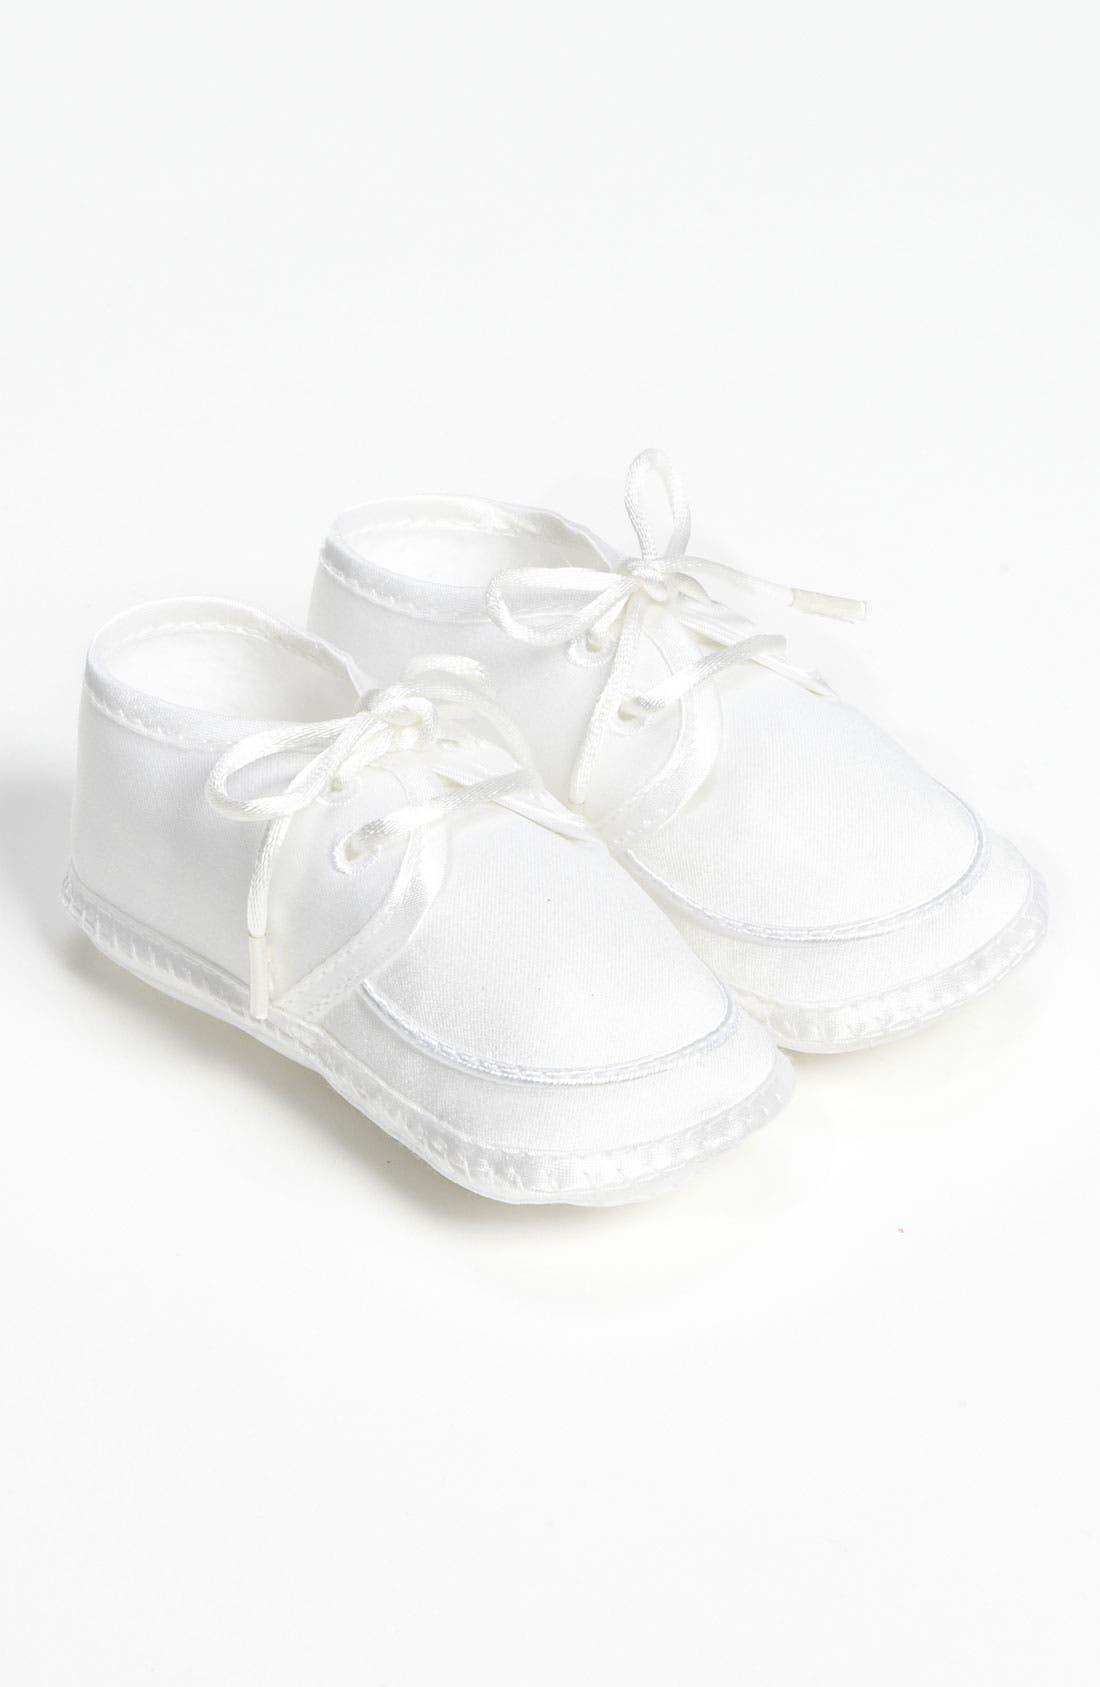 LITTLE THINGS MEAN A LOT Matte Satin Shoe, Main, color, WHITE